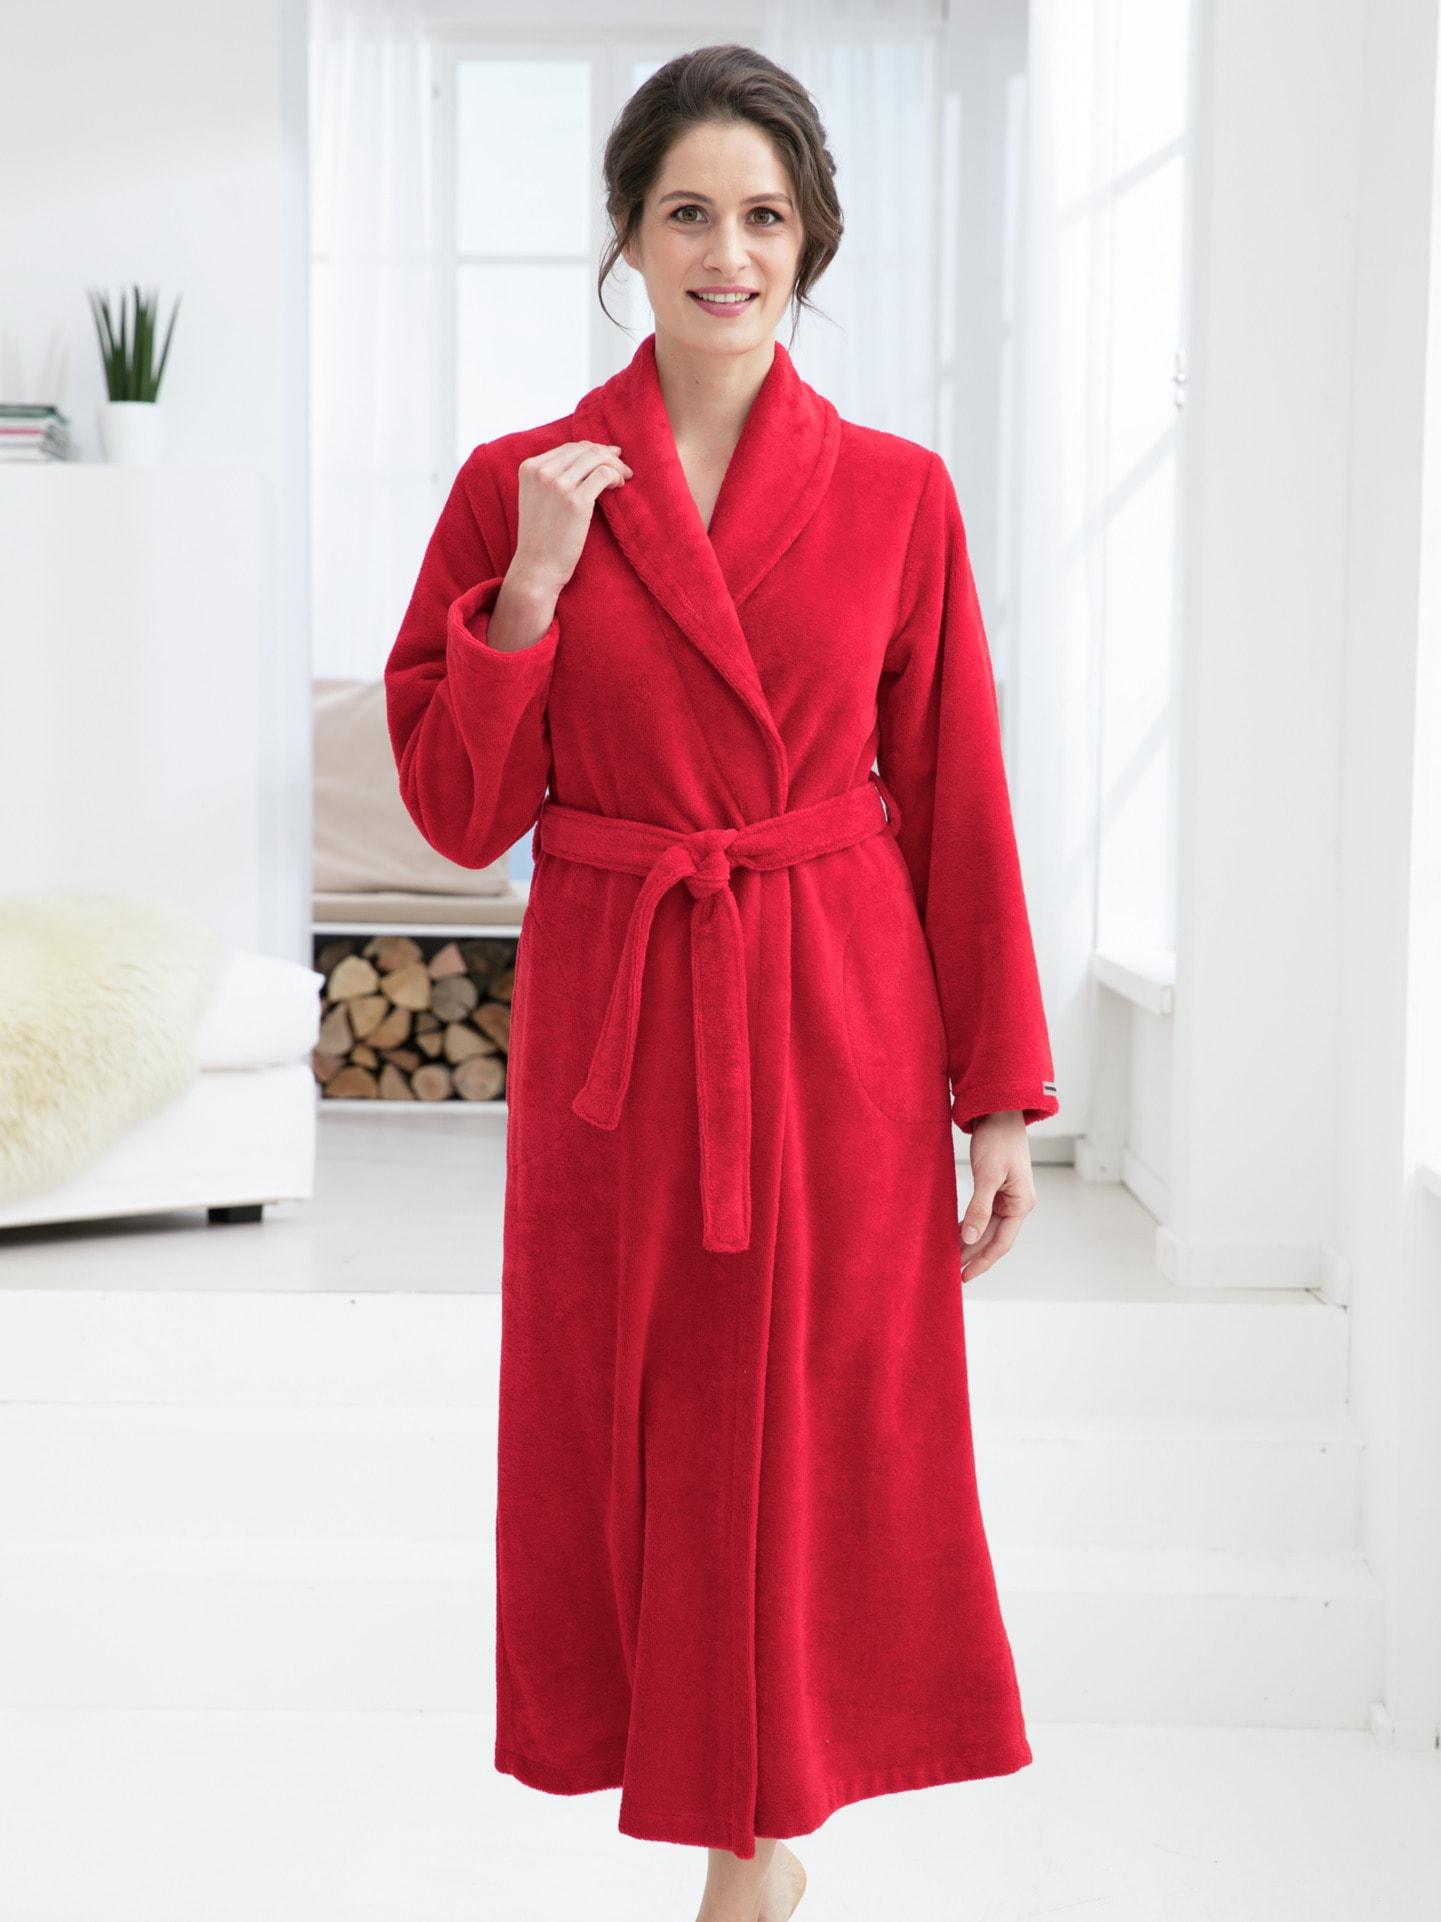 Avena Damen Bademantel Softvelours Rot einfarbig Gr. 42 | Bekleidung > Bademode > Bademäntel | Baumwolle | Avena